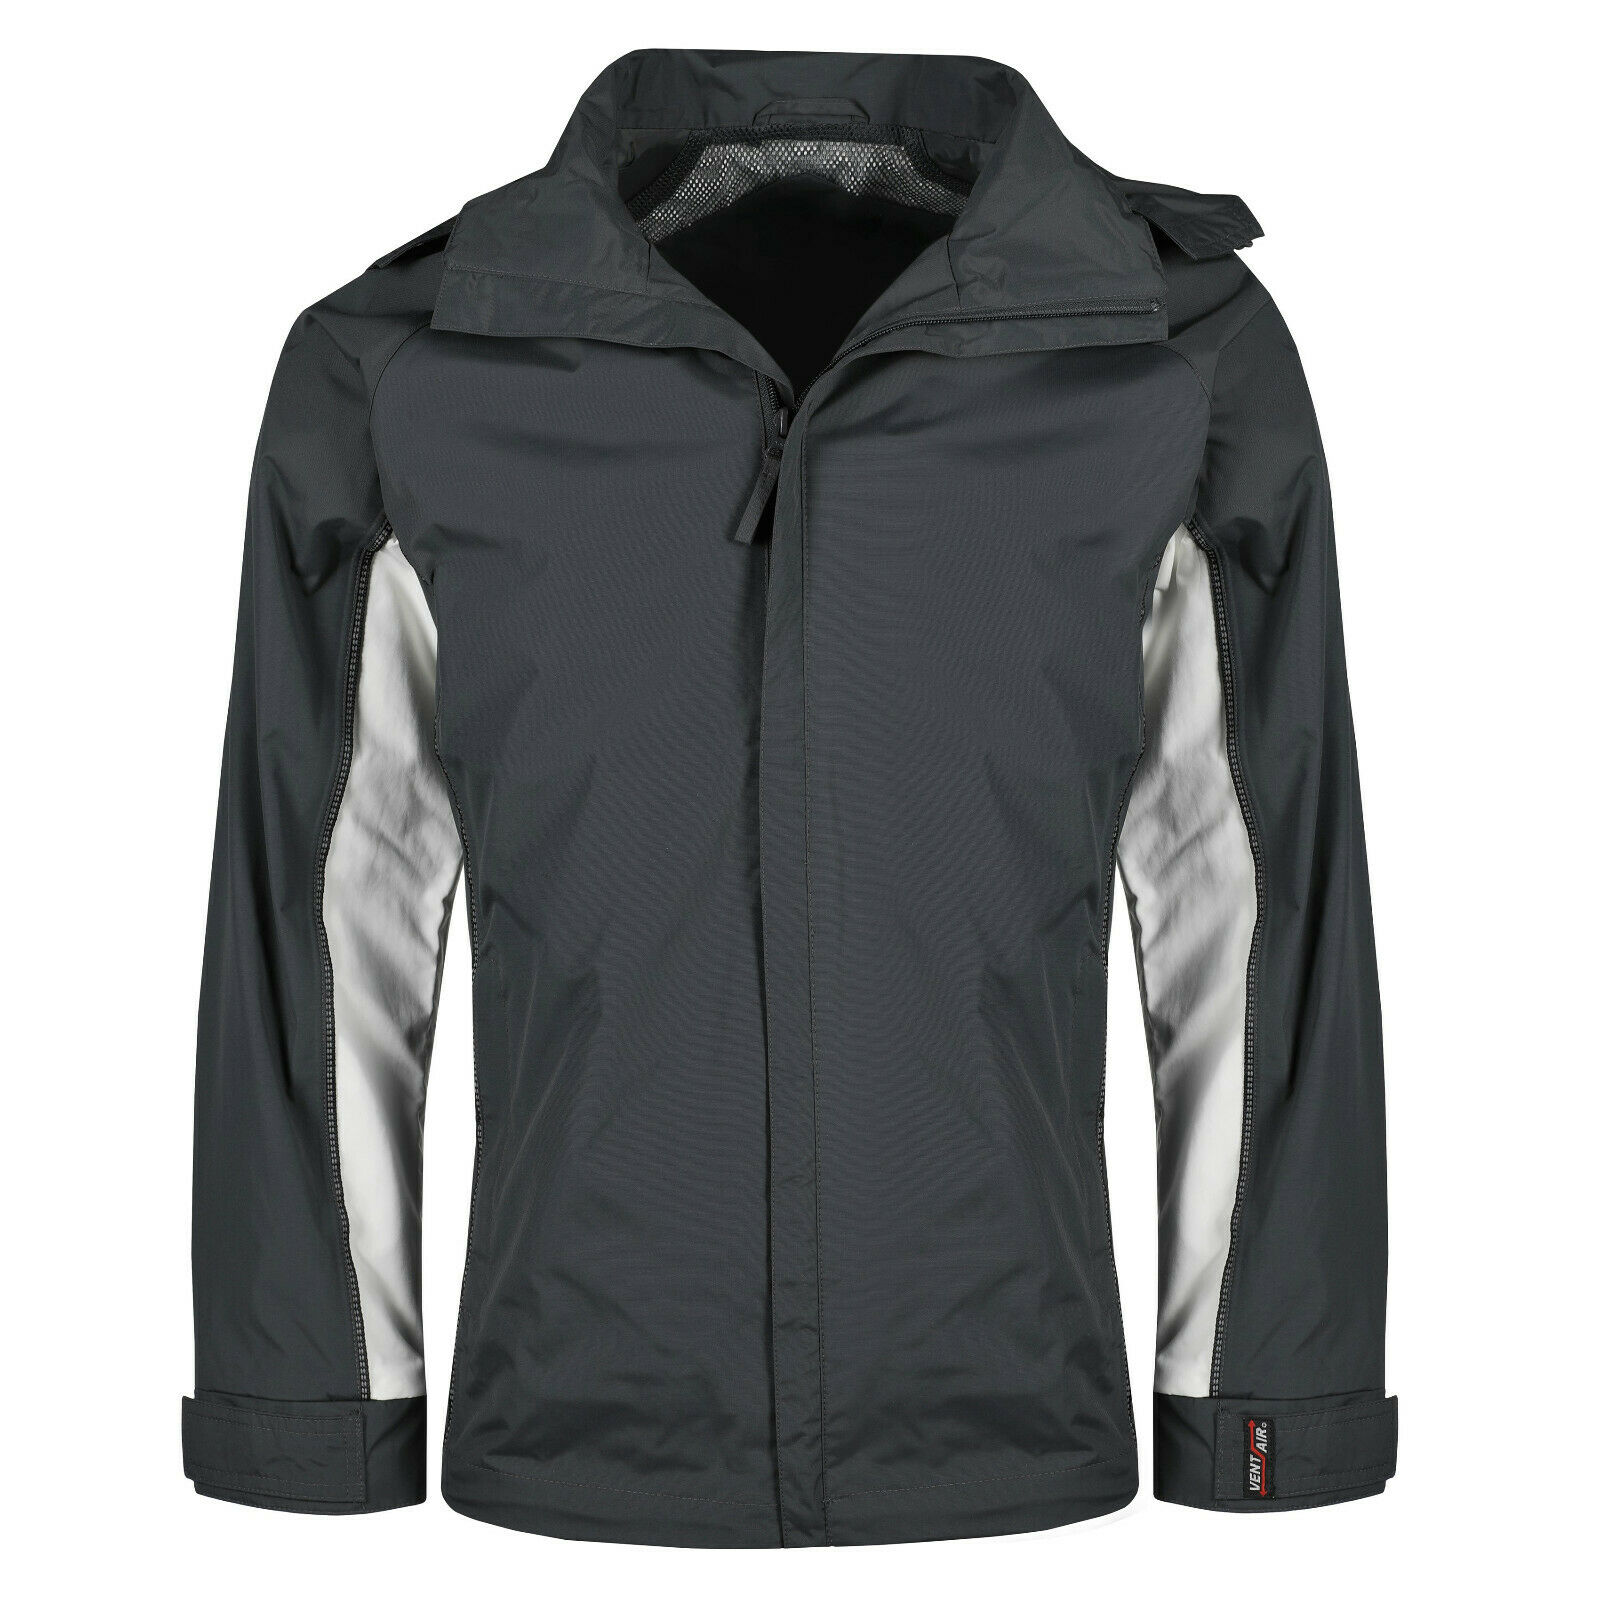 New Mens Raincoat Waterproof Windproof Vent Air Hooded Breathable Outdoor Jacket